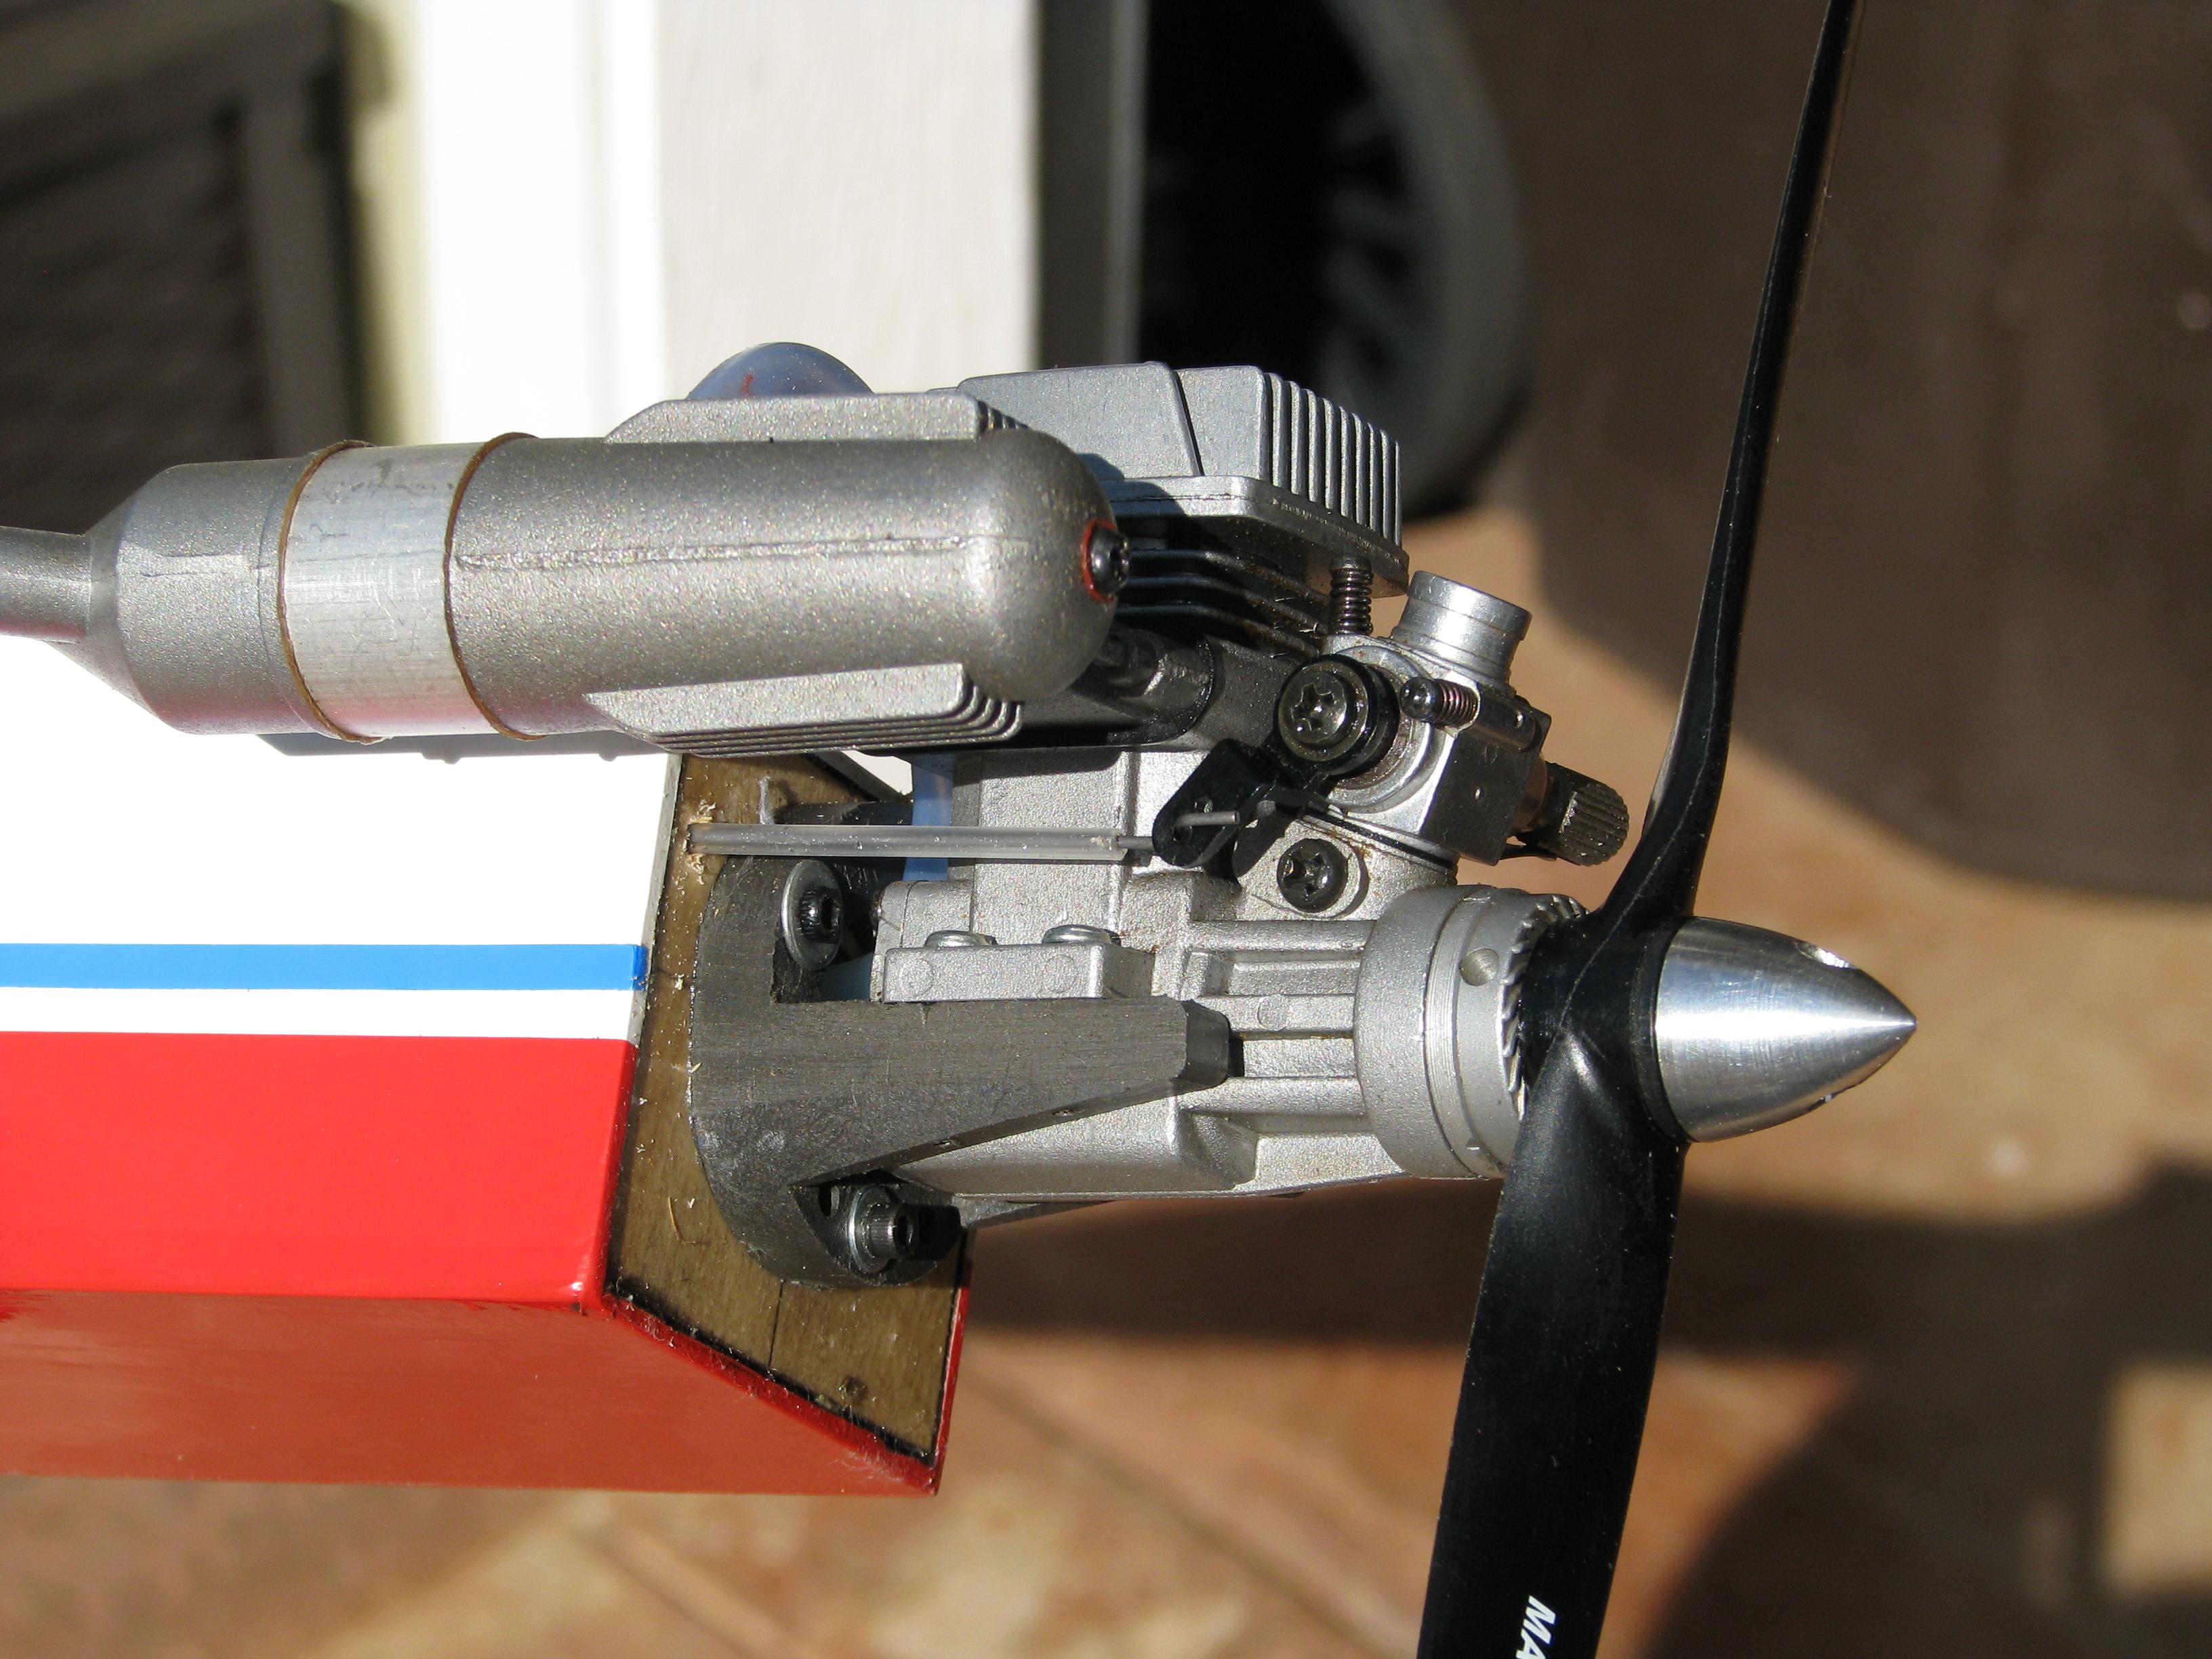 Click image for larger version.  Name:Mini Ulta Stick 017.JPG Views:27 Size:1.76 MB ID:2123655